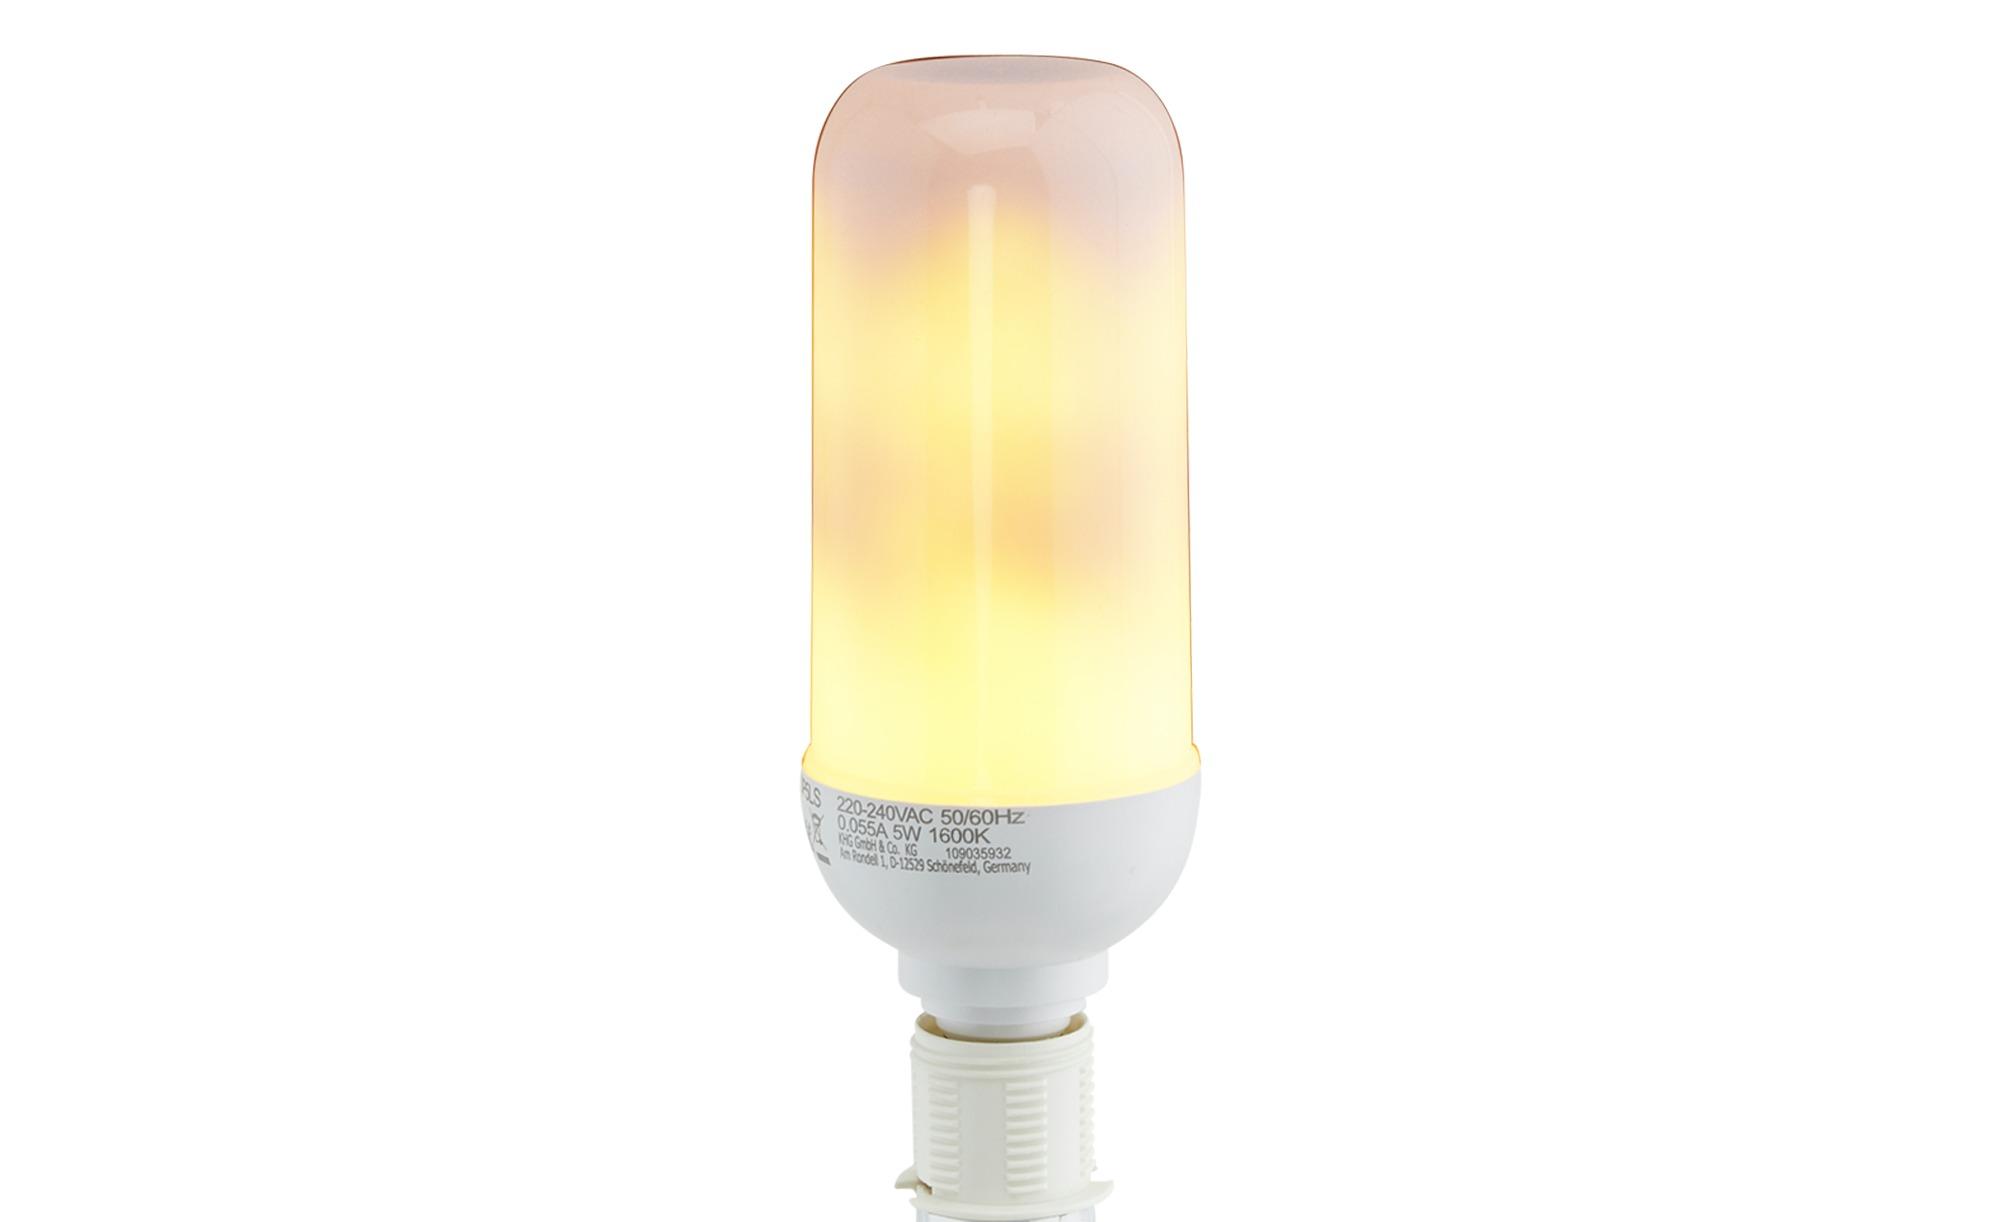 LED-Kerze von KHG